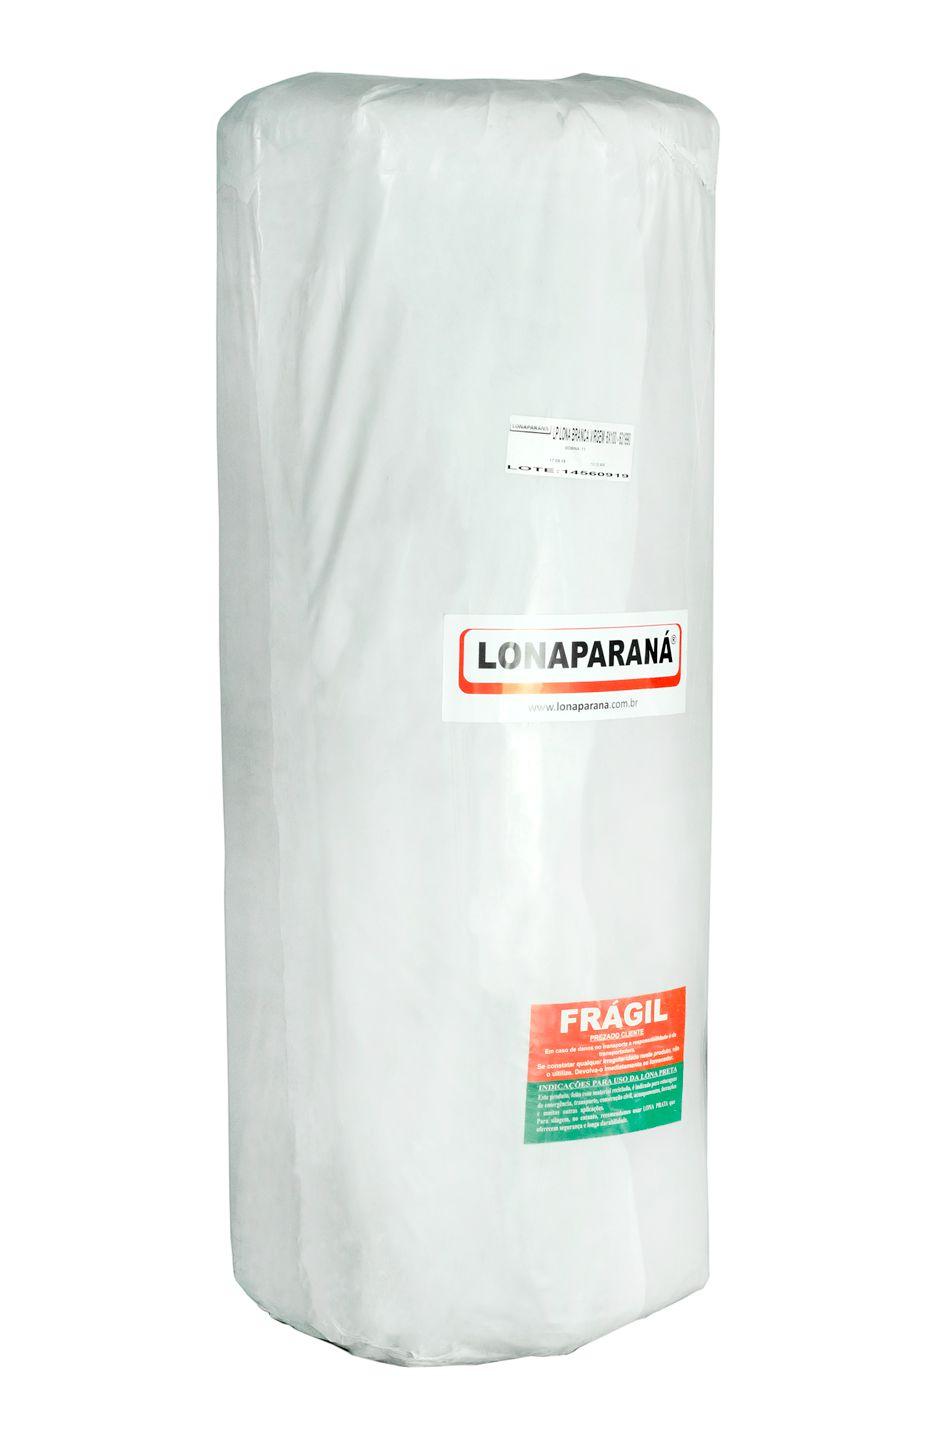 LONA PLÁSTICA BRANCA (CANELA) 4X100 / 24 KG